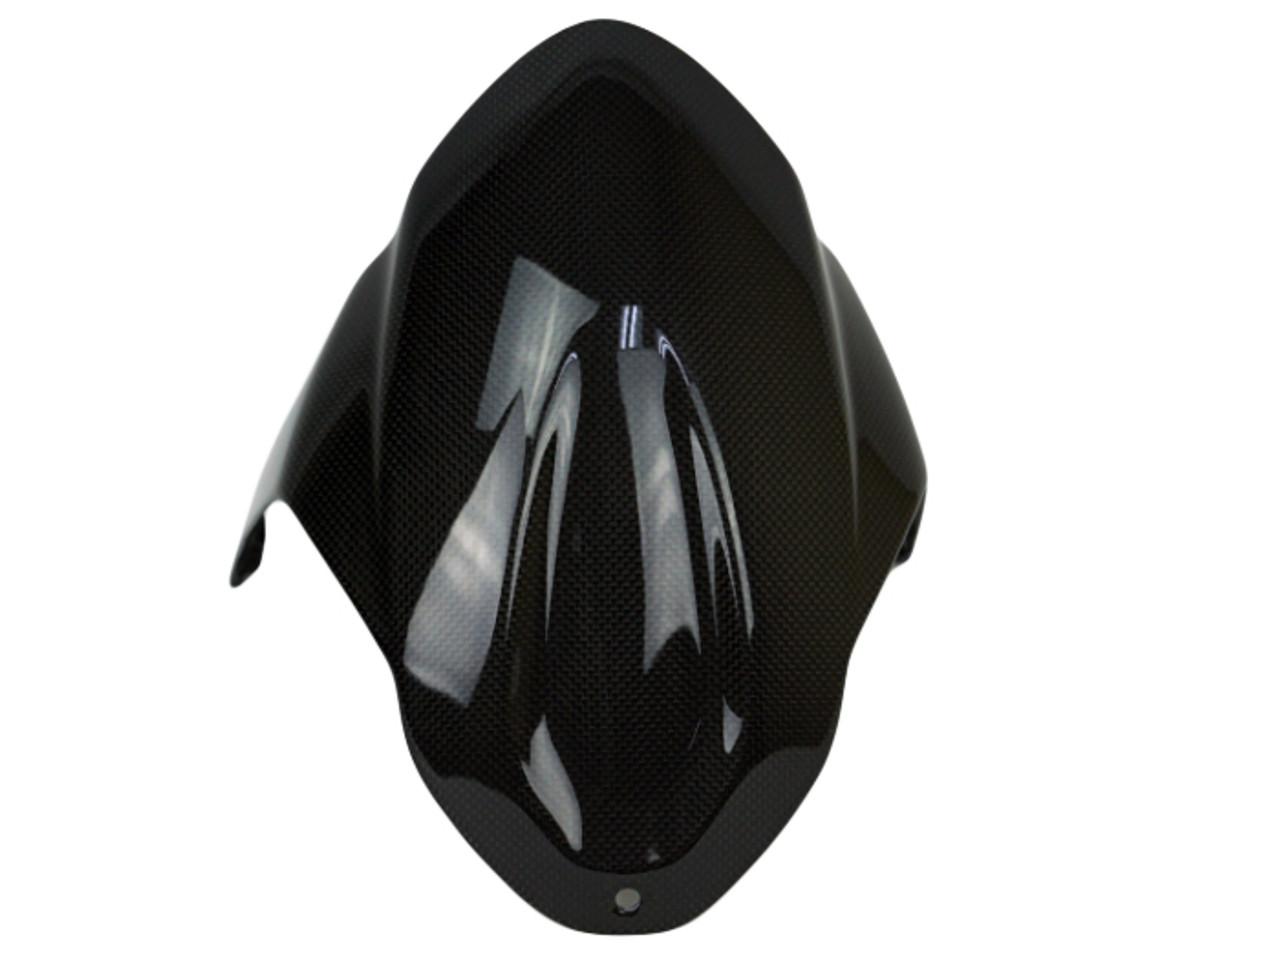 Front Fender in Glossy Twill Weave Carbon Fiber for MV Agusta Brutale 800 2016+